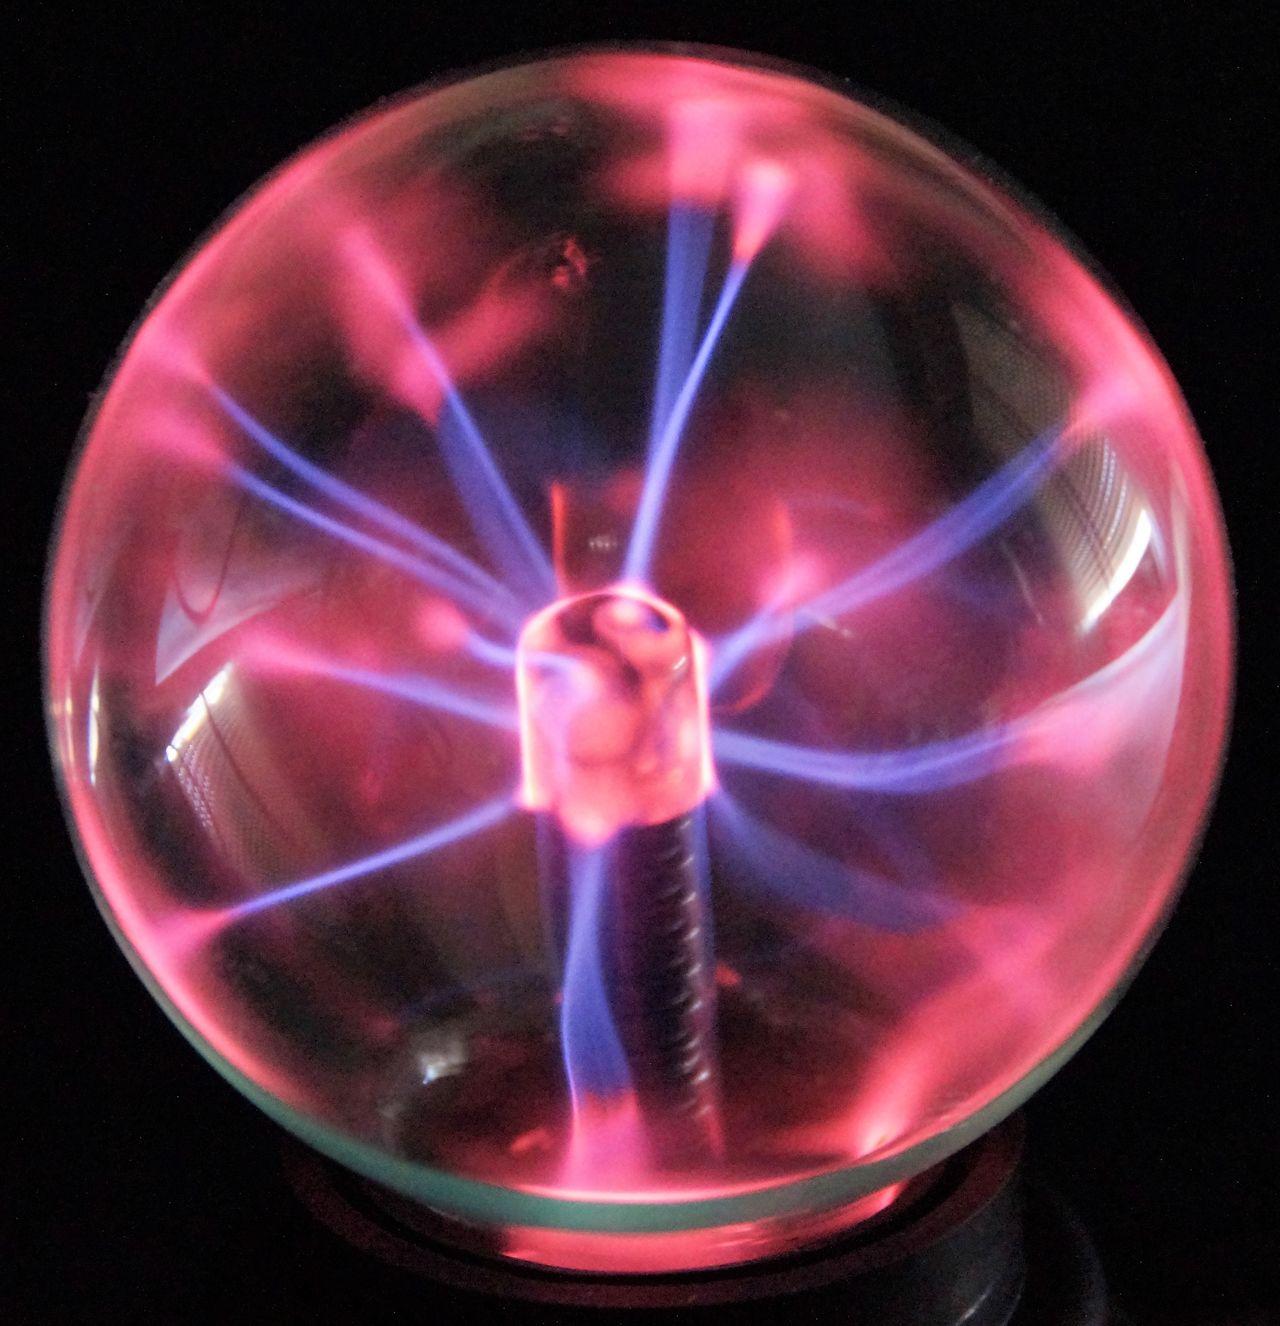 Black Background Bola De Cristal Bola De Plasma Circle Cristal Ball Dark Pink Color Plasma Plasma Ball Plasma Lamp RAYOS Sphere Studio Shot Thunders